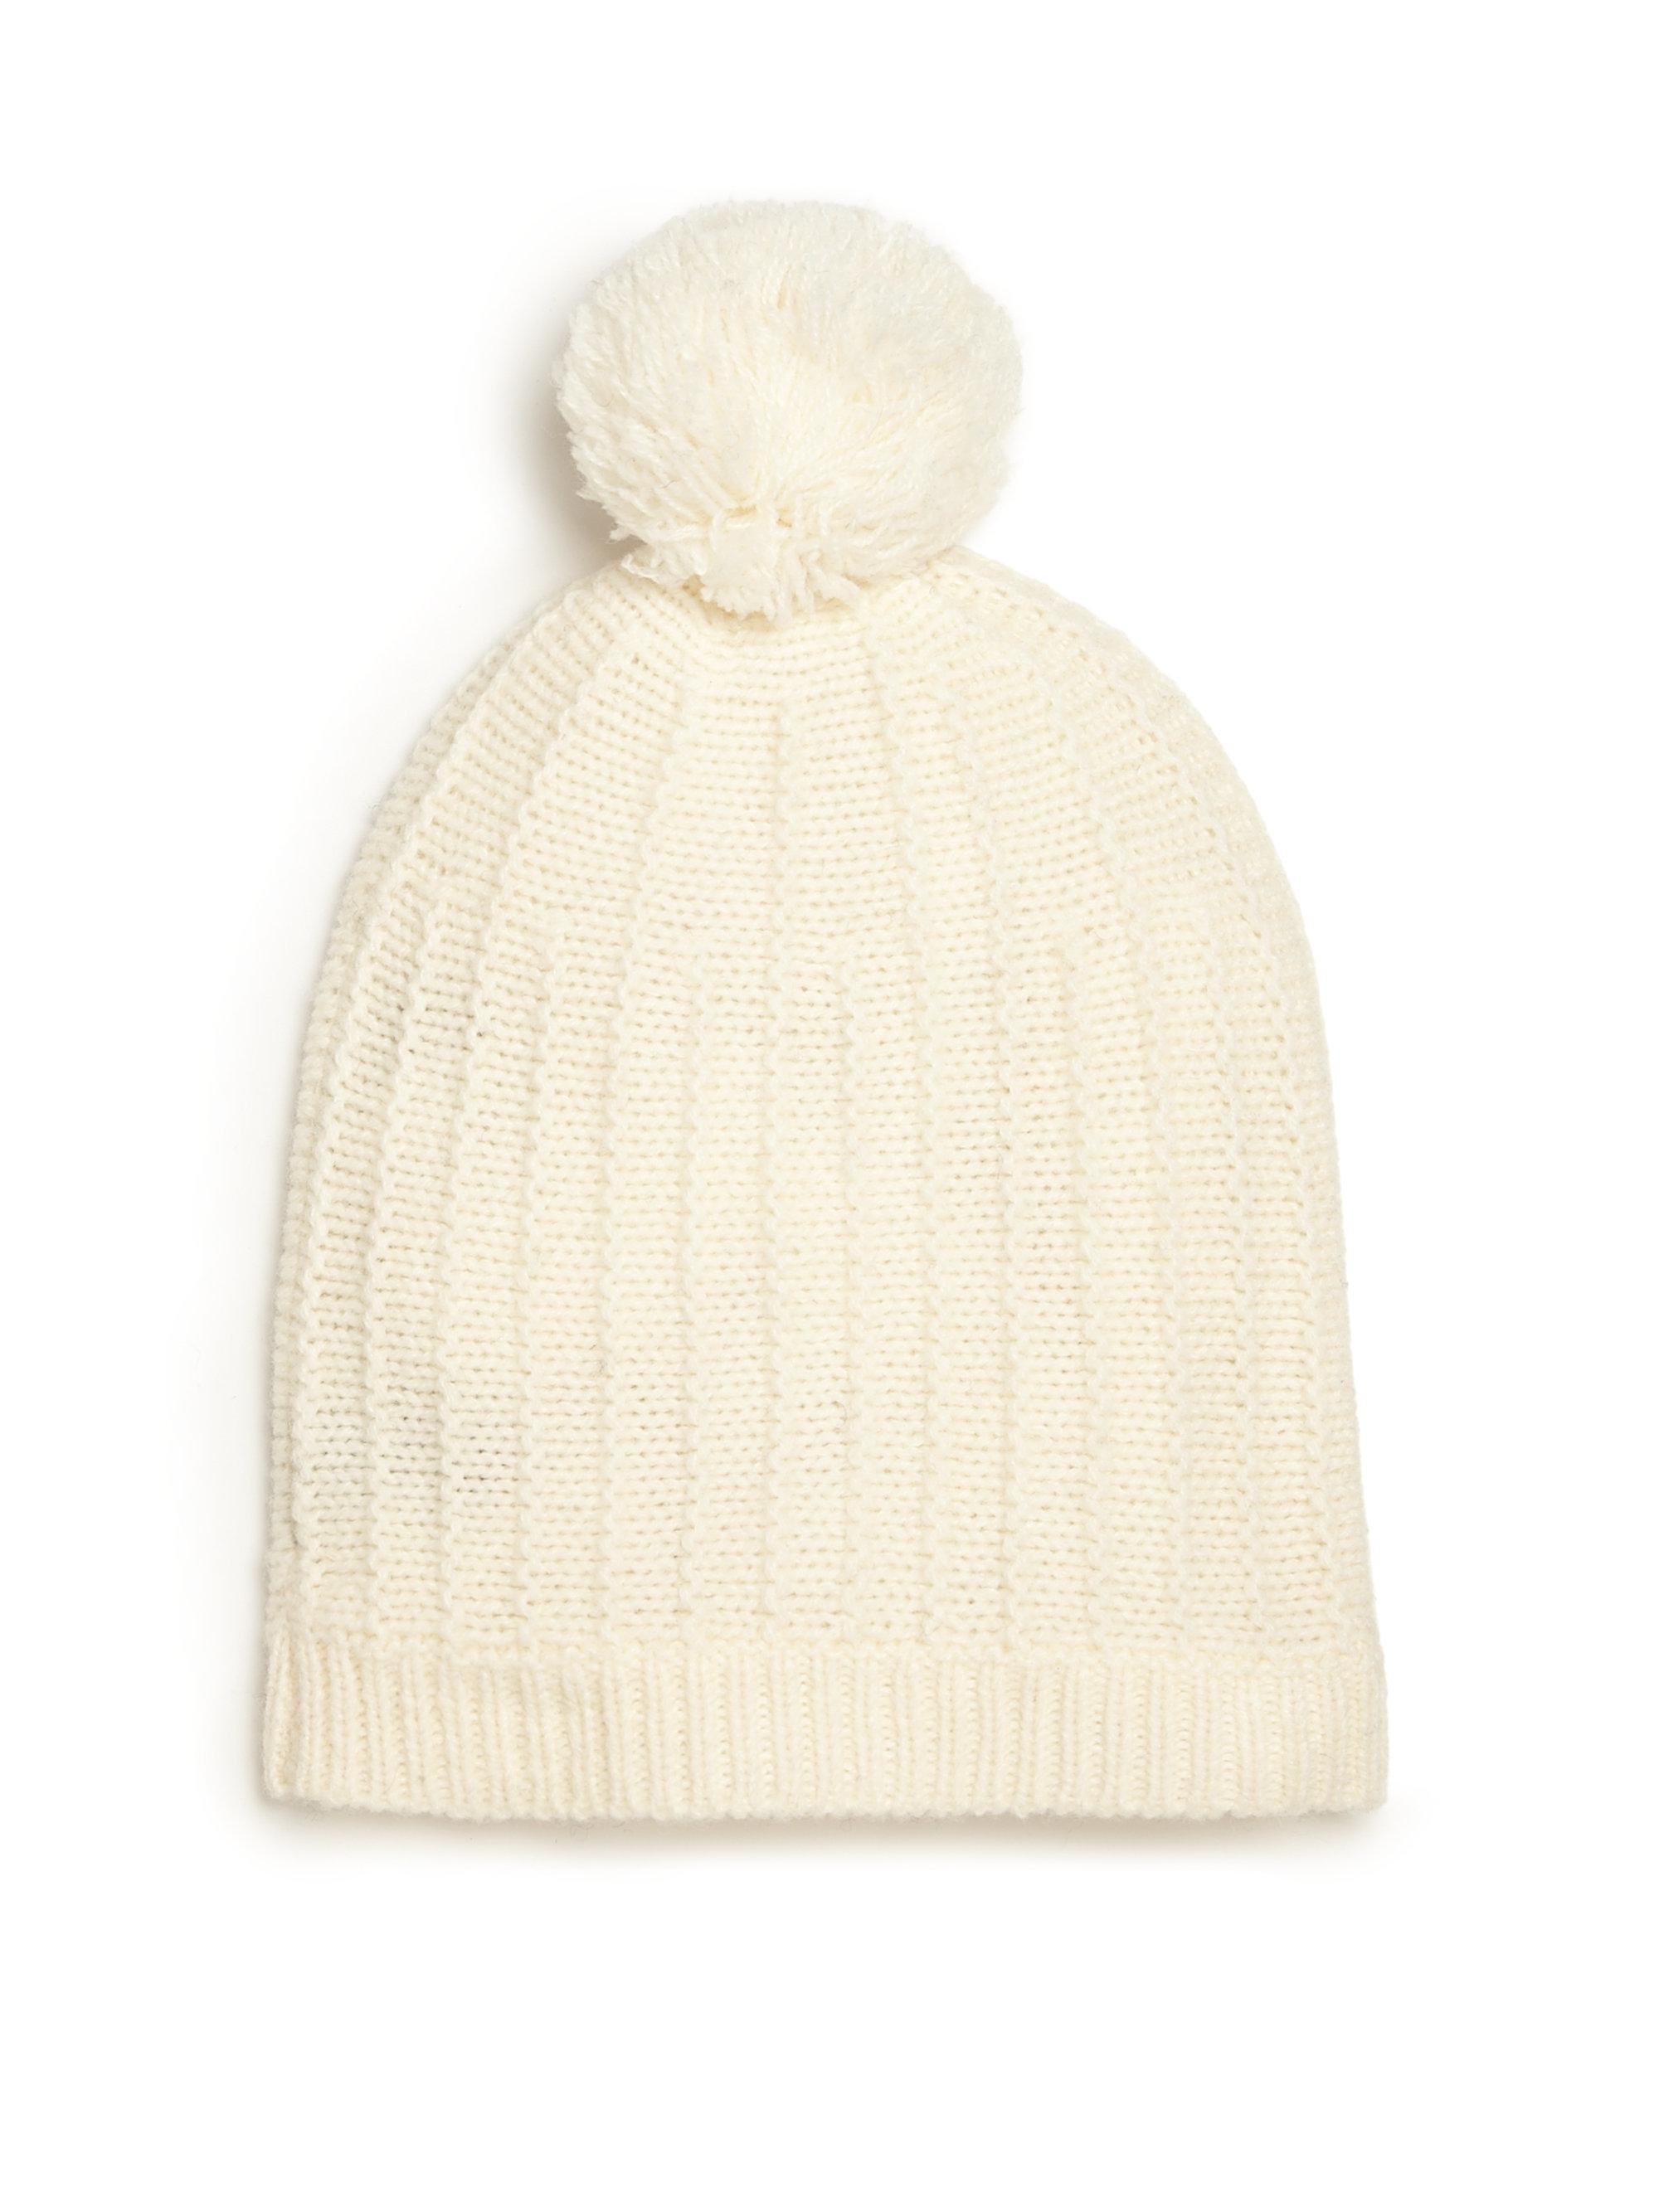 de691305440cf5 360cashmere Knit Pom Pom Hat in Natural - Lyst